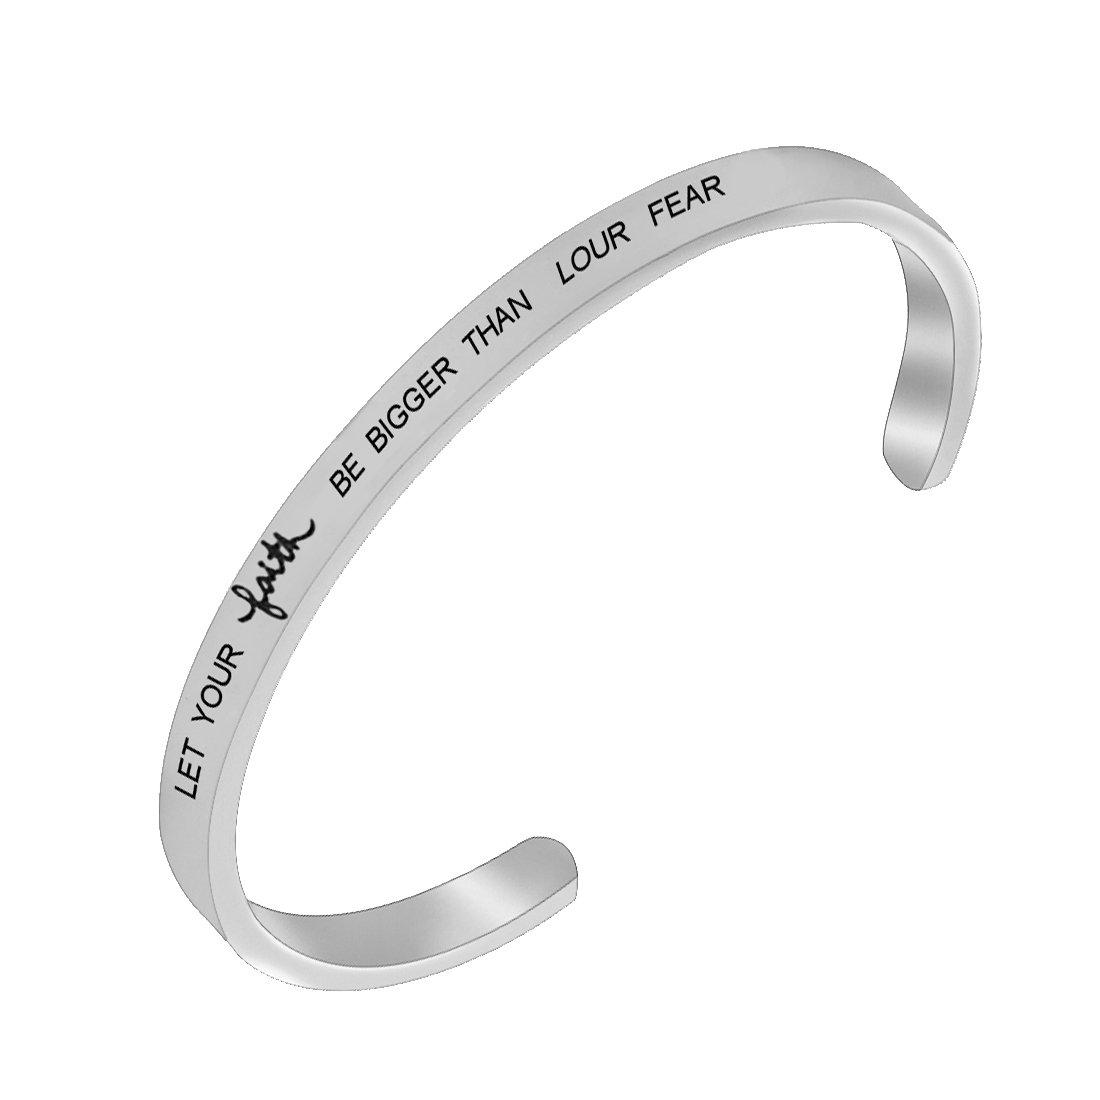 REEBOOO Christian Bracelet Faith Bracelet Let your Faith be bigger than your fear Gift For Her (Let your faith-Silver-CB)